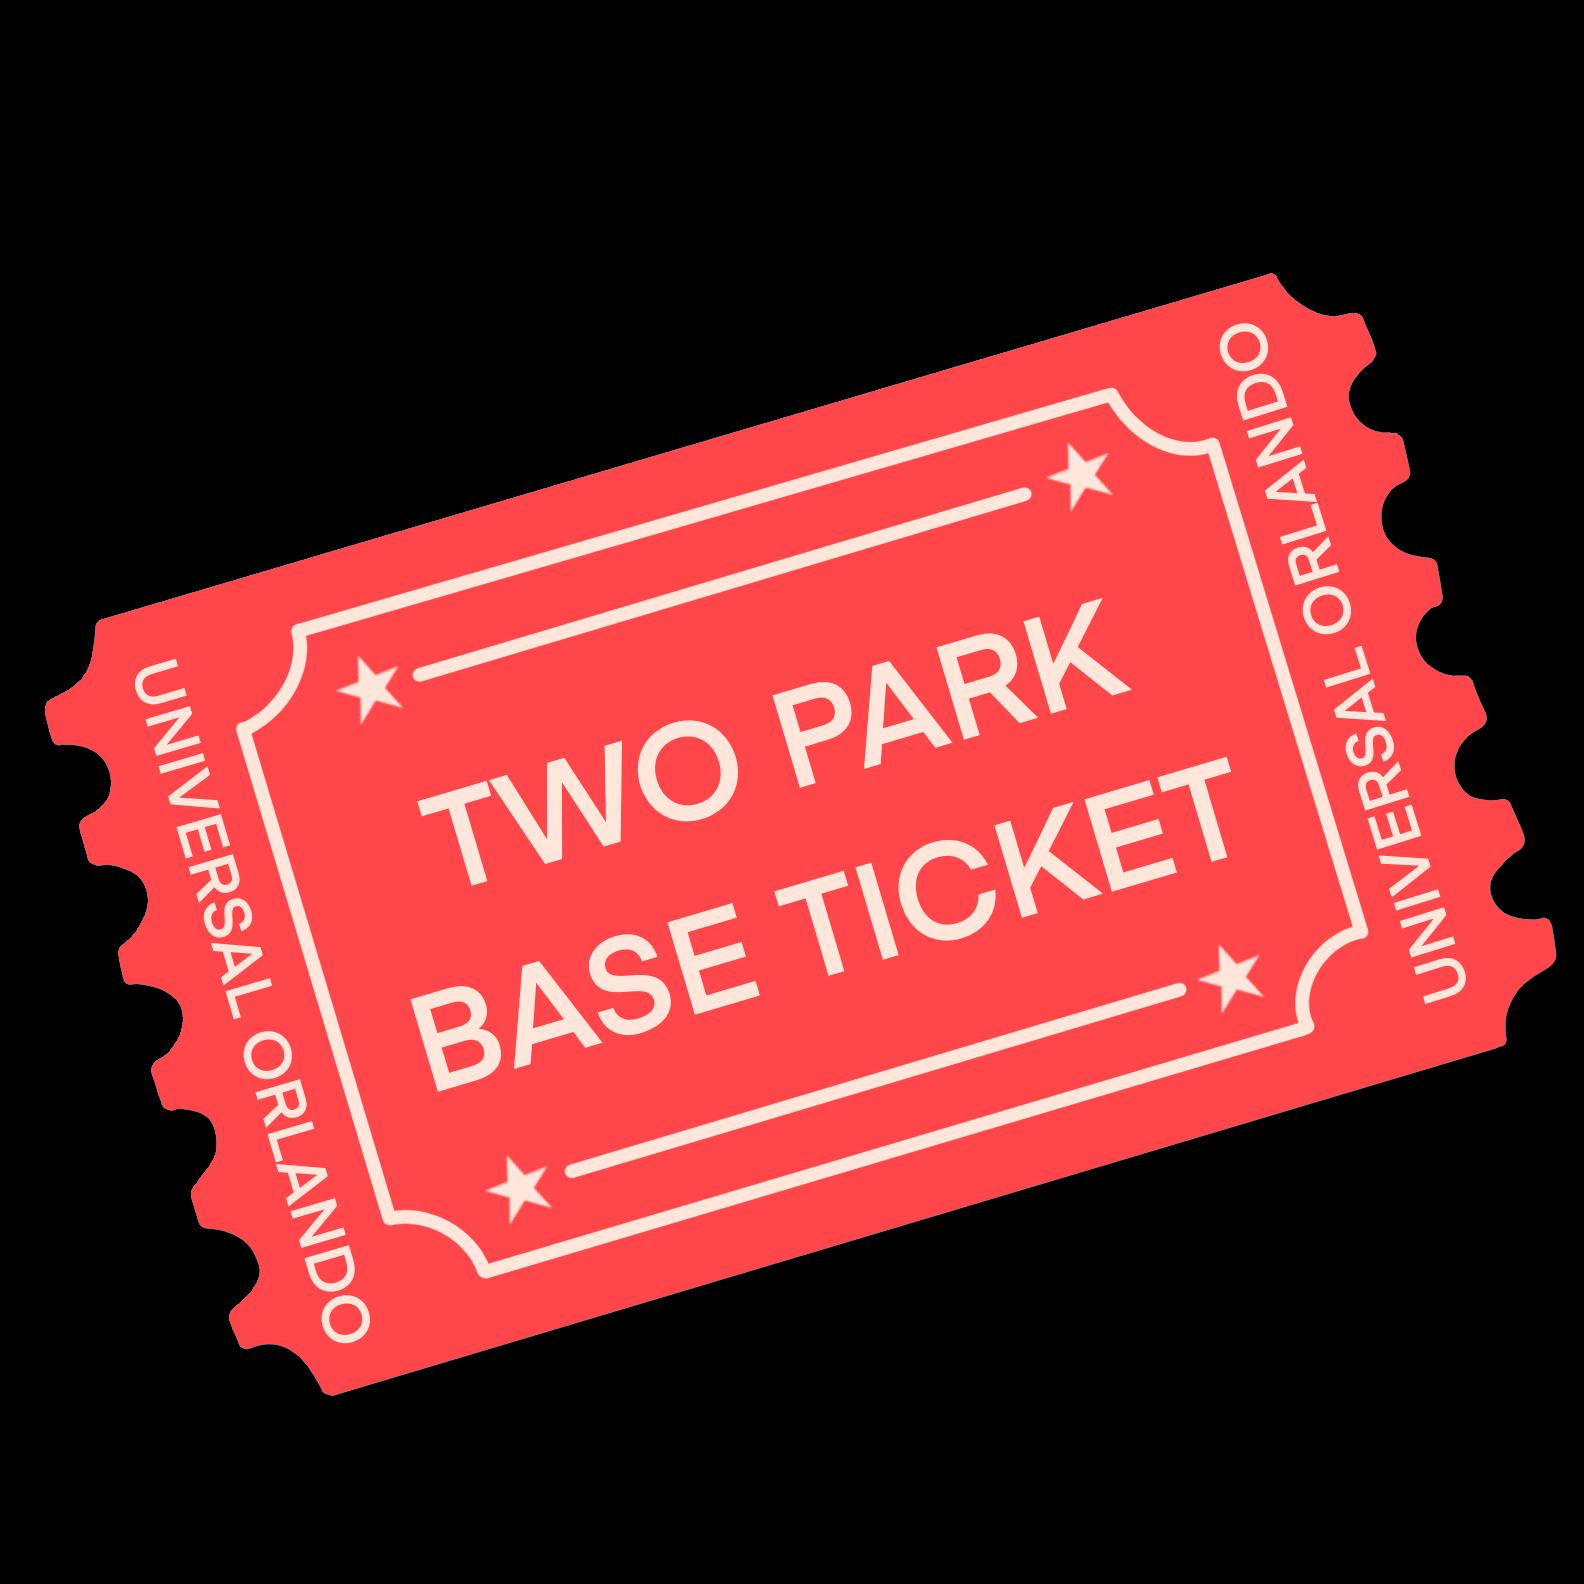 universal-2-park-ticket